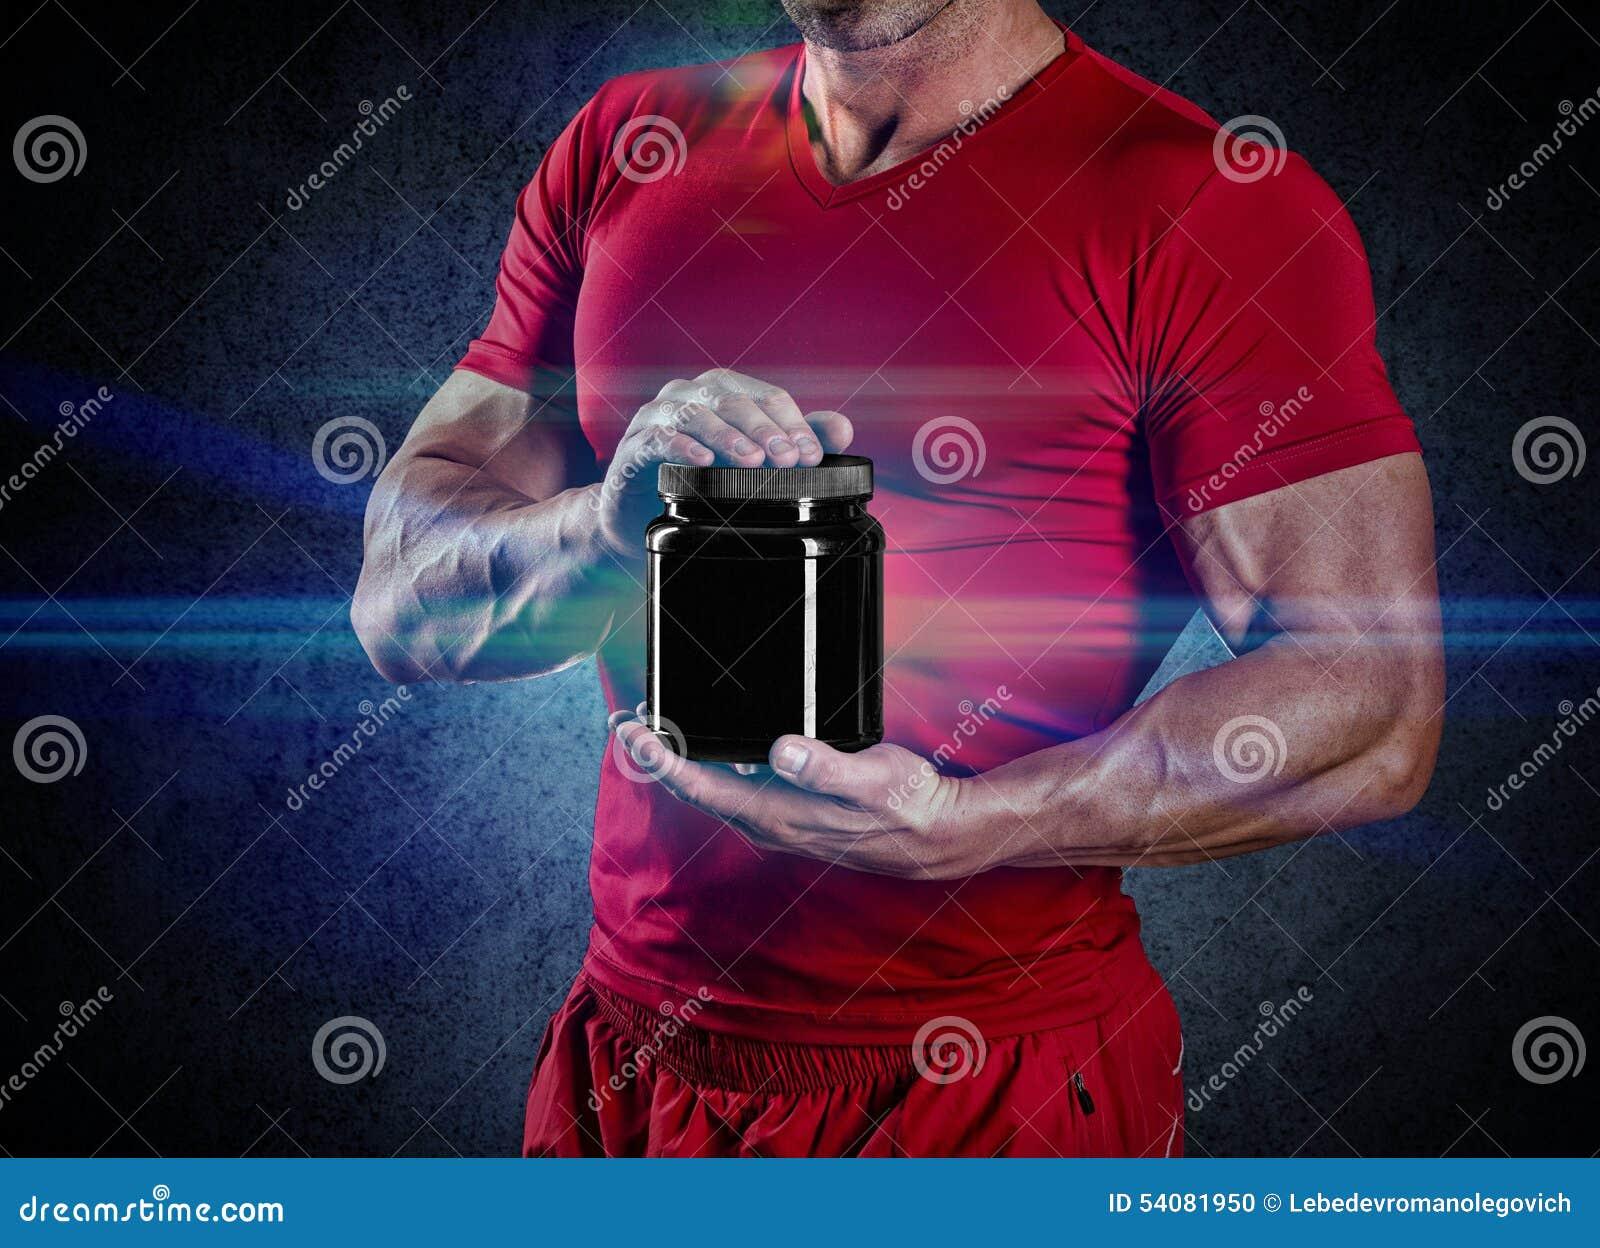 Sport, het bodybuilding, sterkte en mensenconcept - jonge mensensta